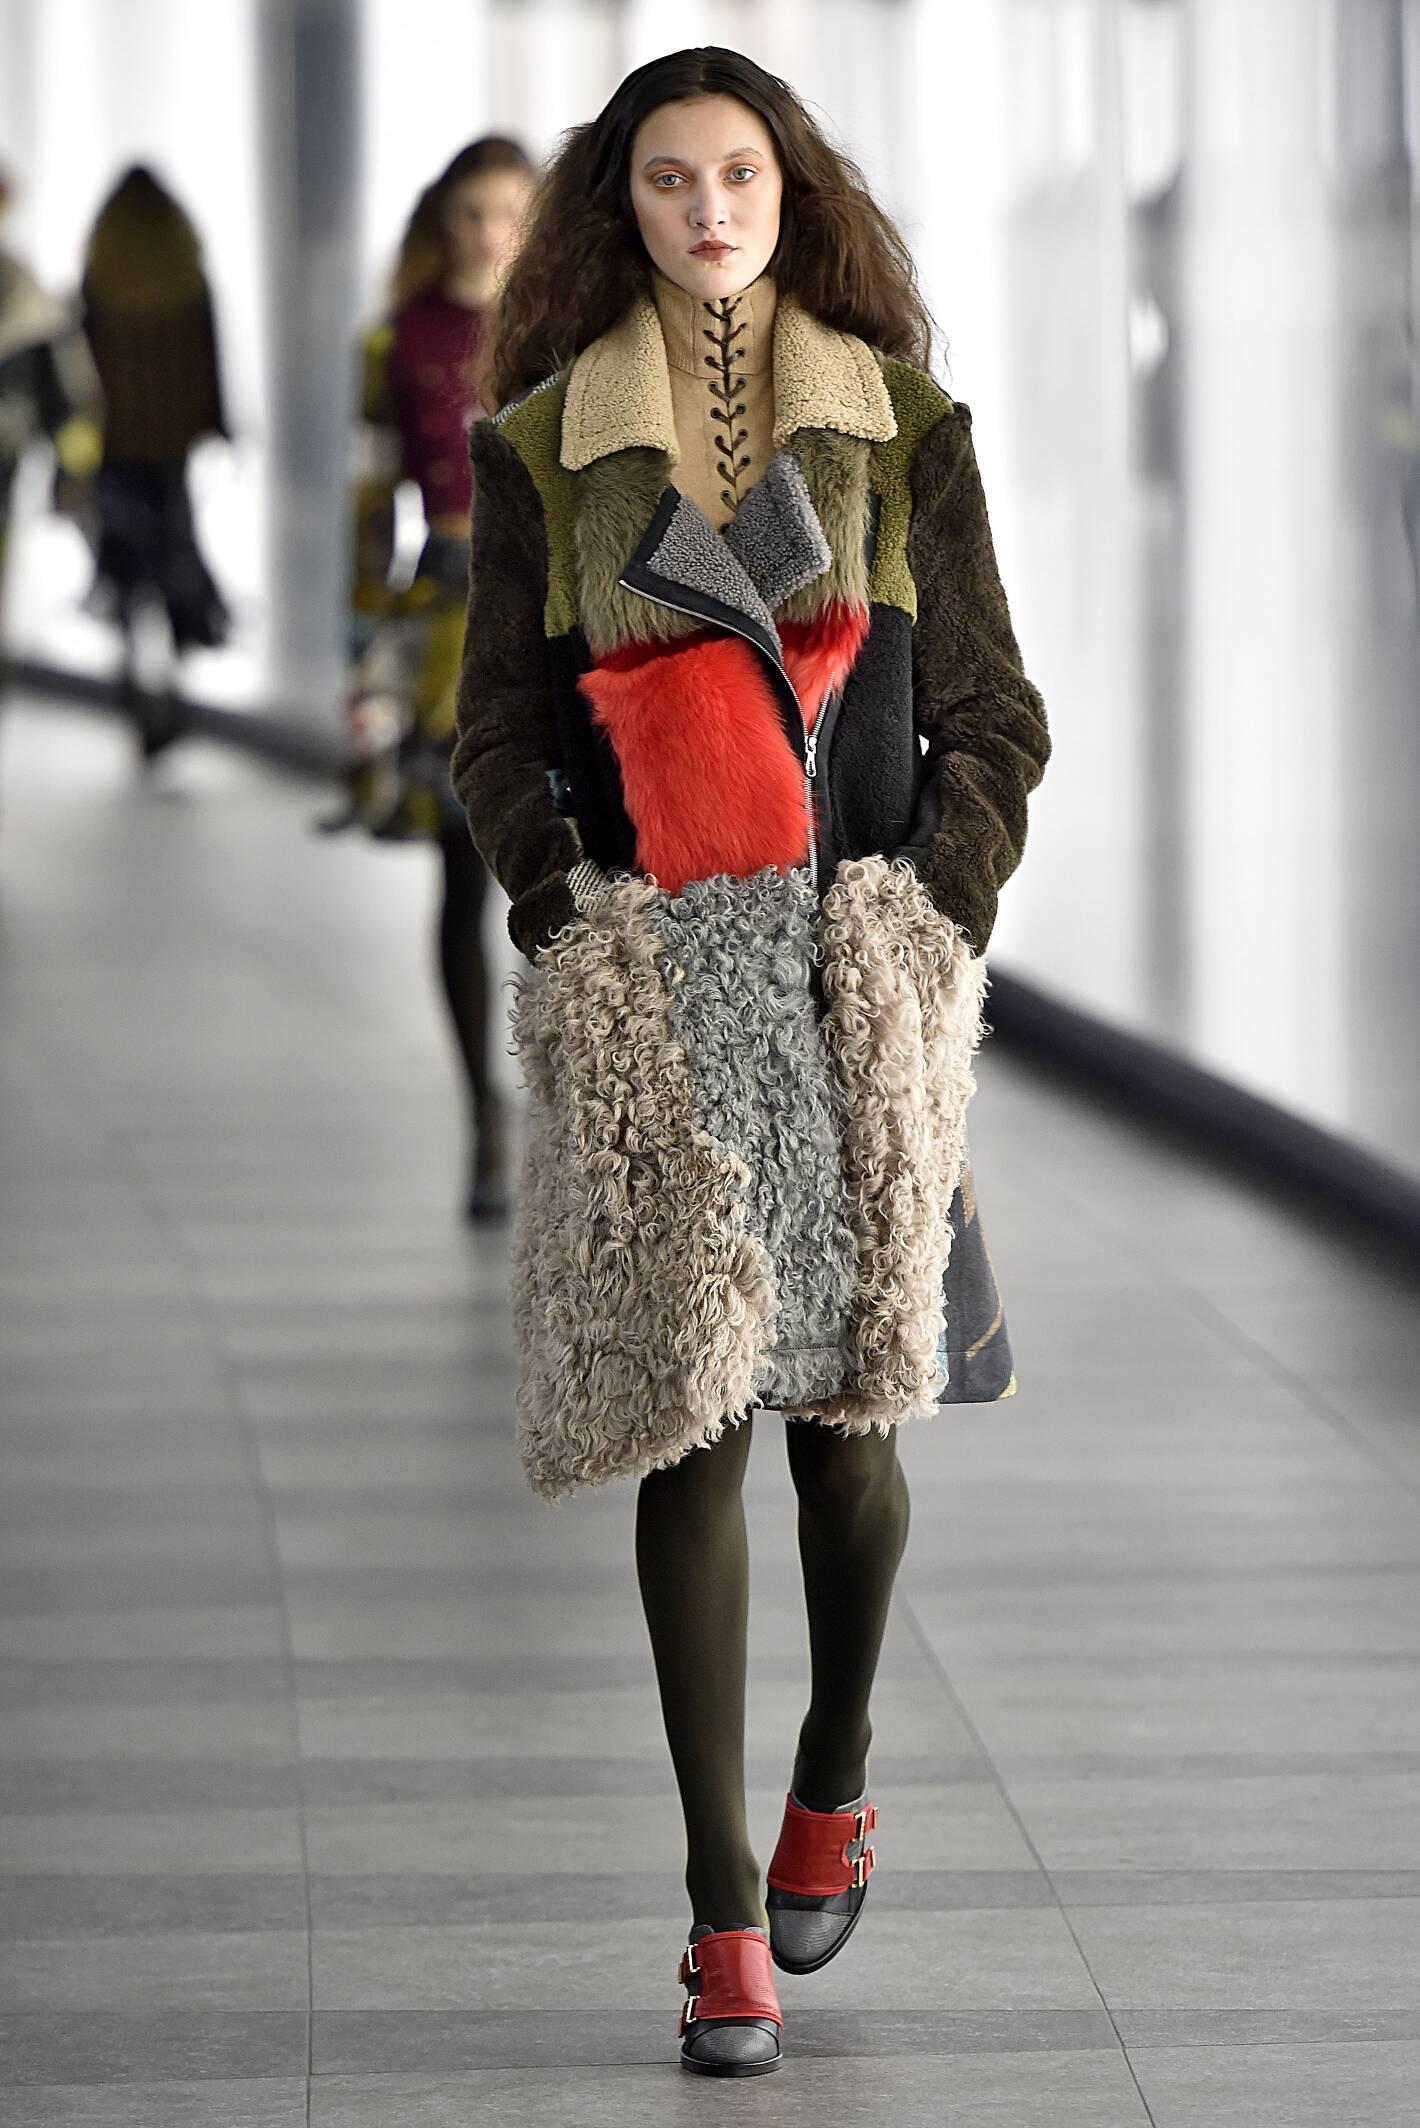 2016 Fall Fashion Woman Preen by Thornton Bregazzi Collection